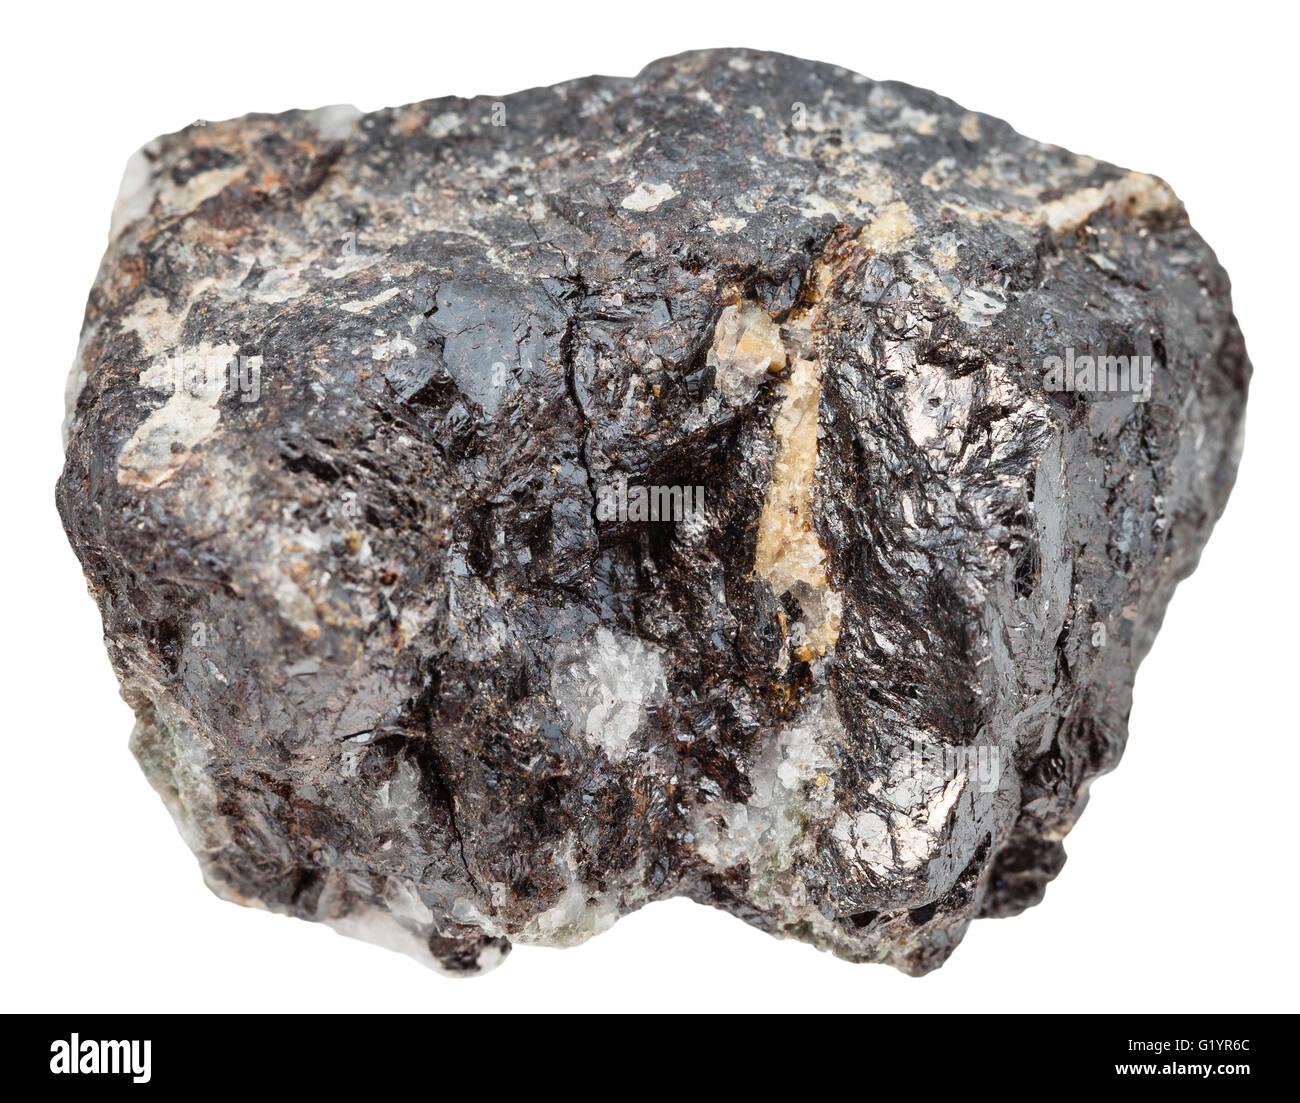 macro shooting of natural mineral stone - specimen of sphalerite (zinc blende) isolated on white background - Stock Image